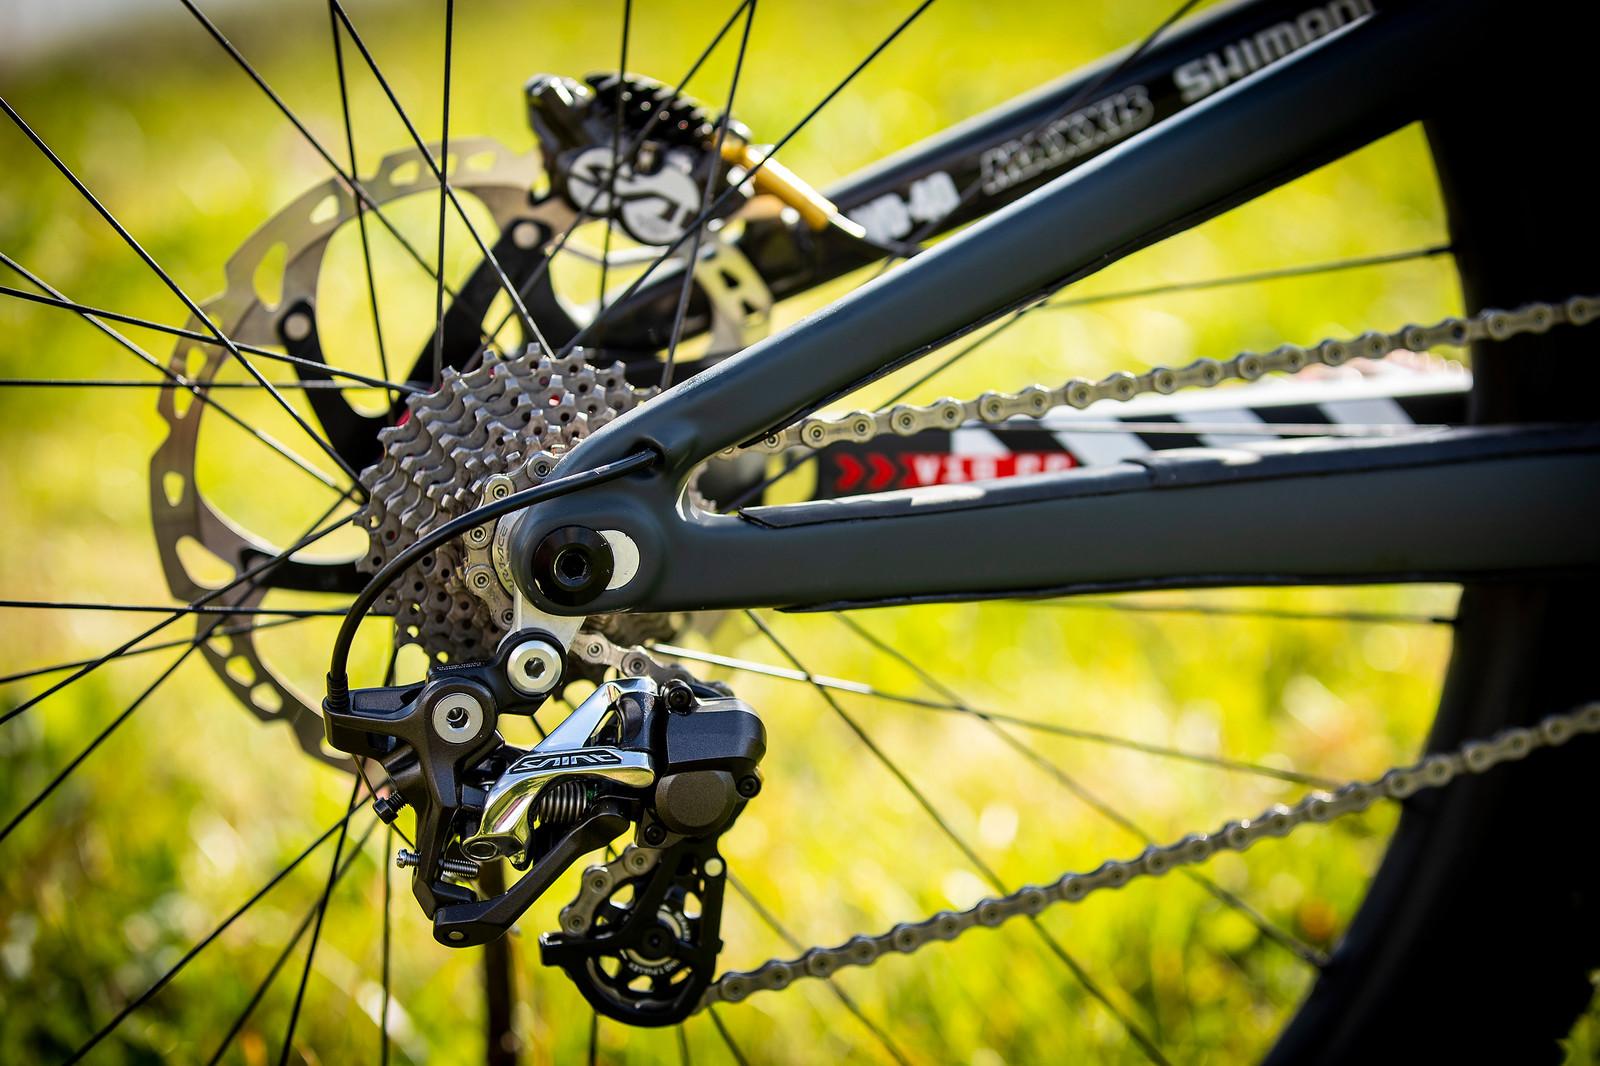 The All Saints - WORLD CHAMPS BIKE - Luca Shaw's Santa Cruz V10 - Mountain Biking Pictures - Vital MTB